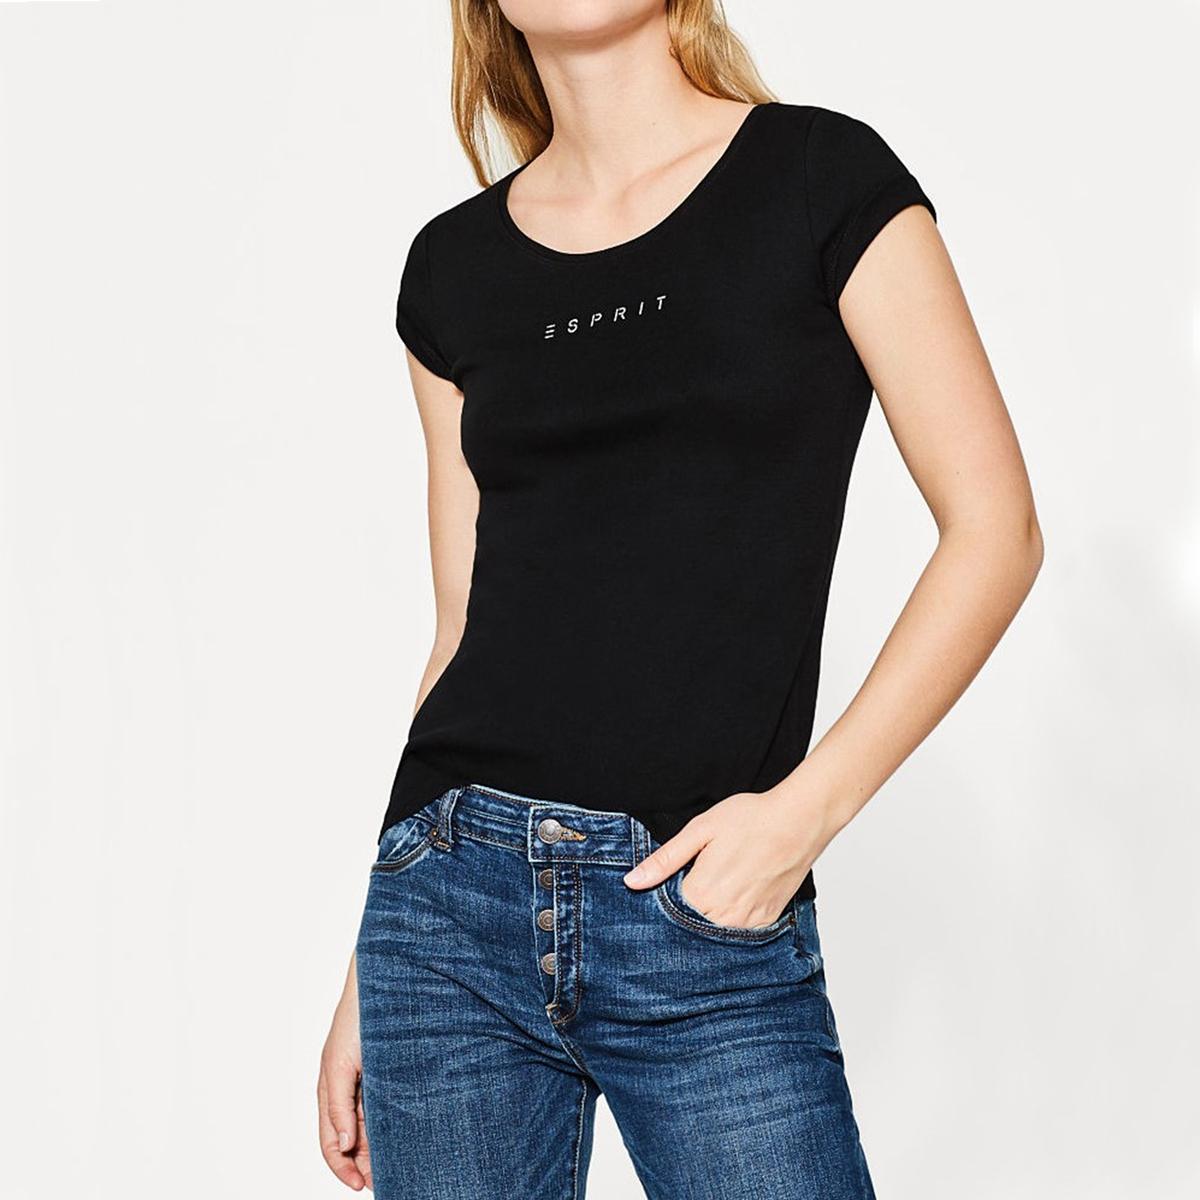 Camiseta lisa con cuello redondo y manga corta